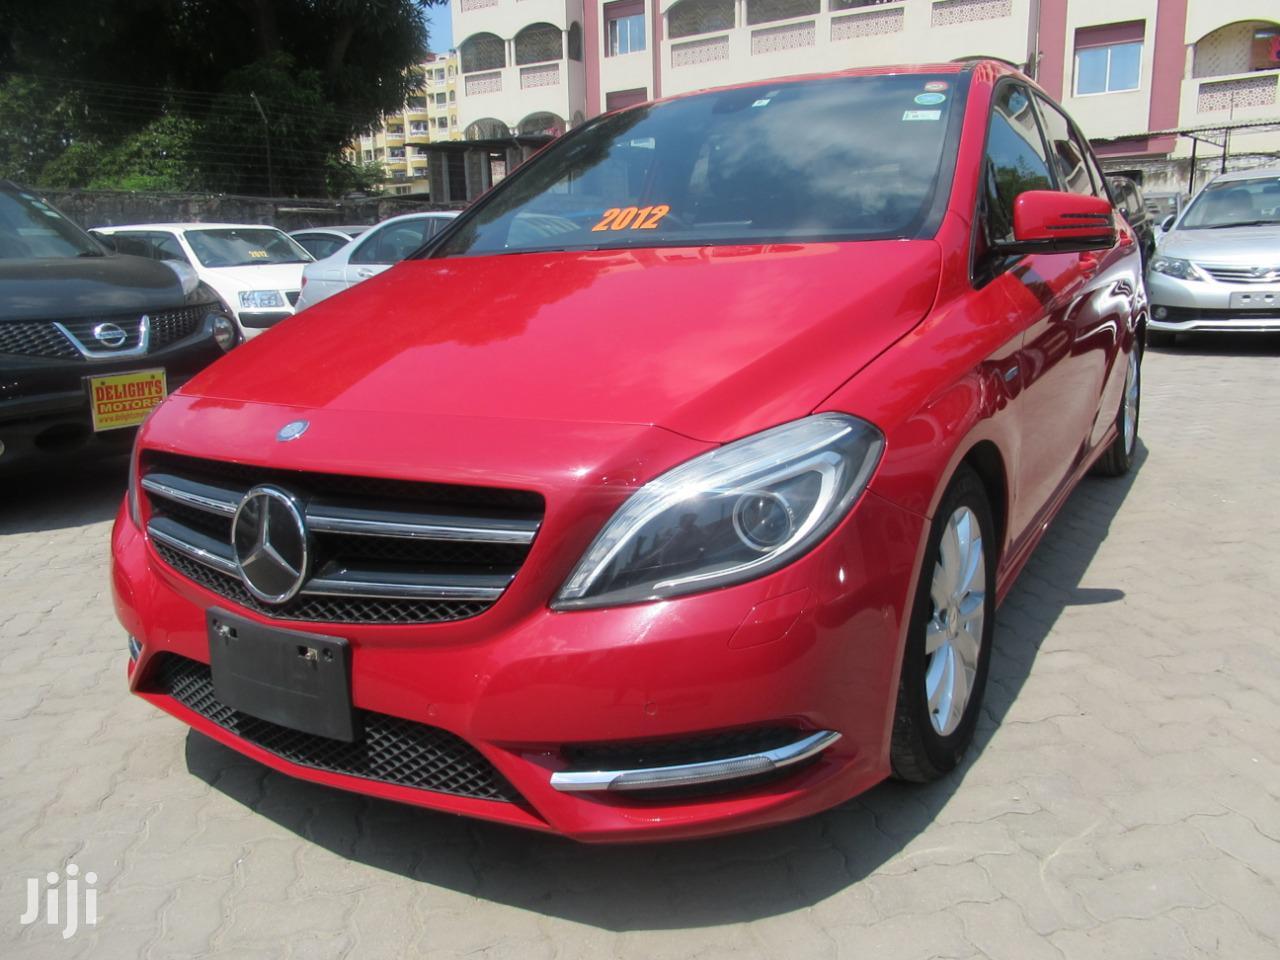 New Mercedes-Benz B-Class 2012 Red | Cars for sale in Mvita, Mombasa, Kenya